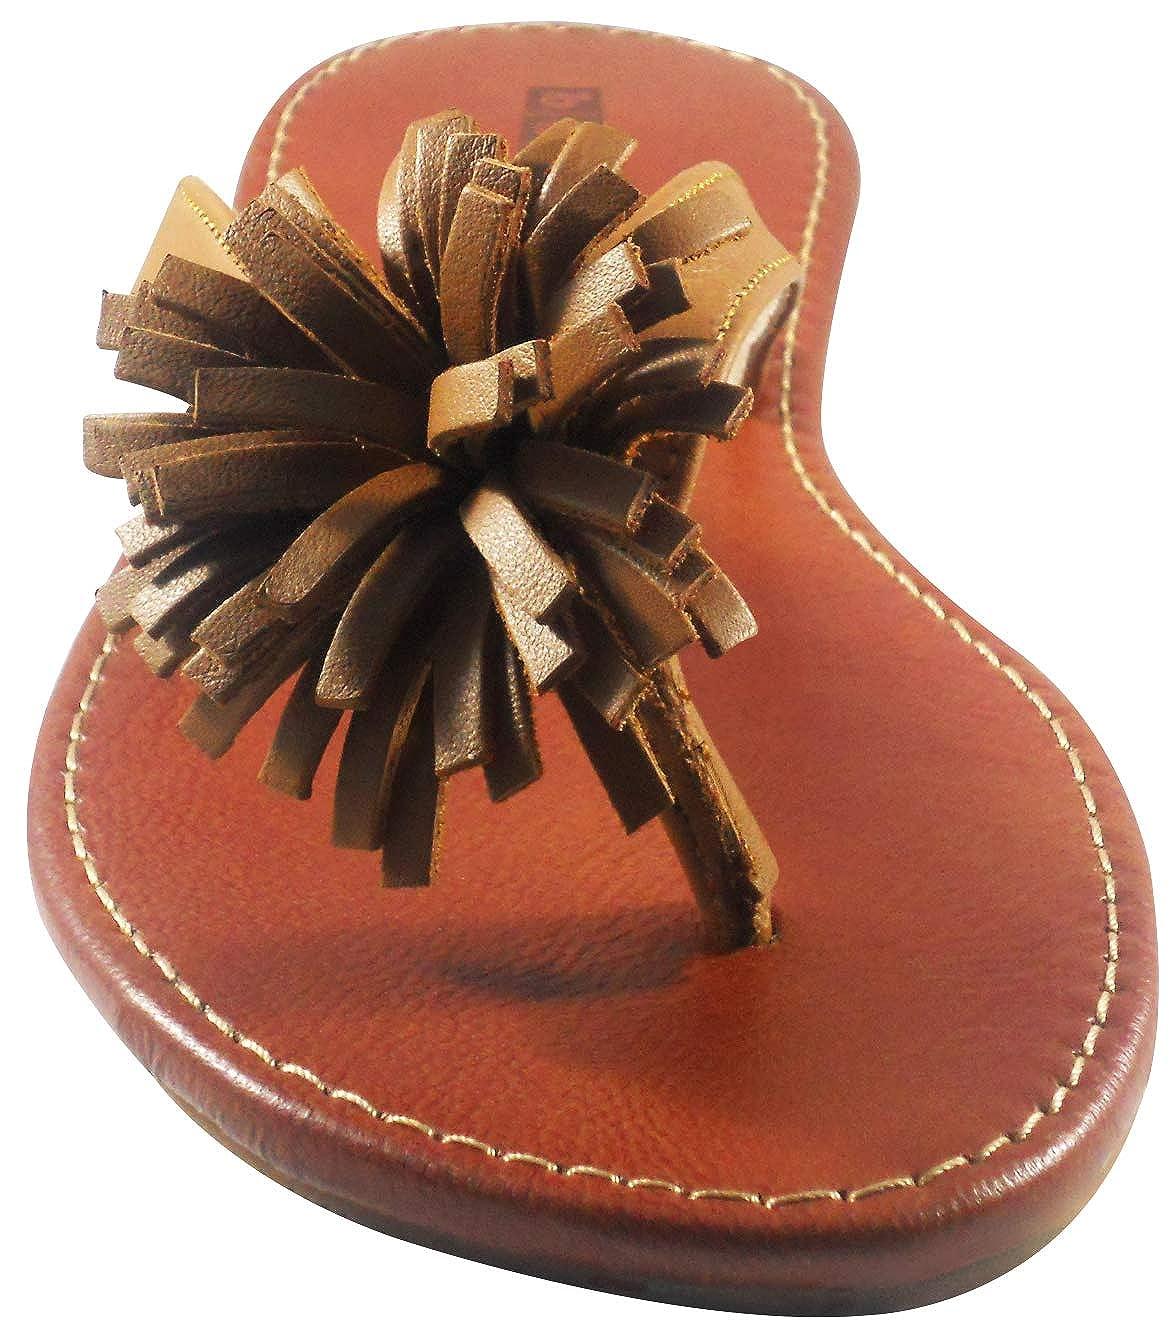 BOBBLEKIDS Pompi 13.5M Leather Shoes Little Girls Caramel Sandal